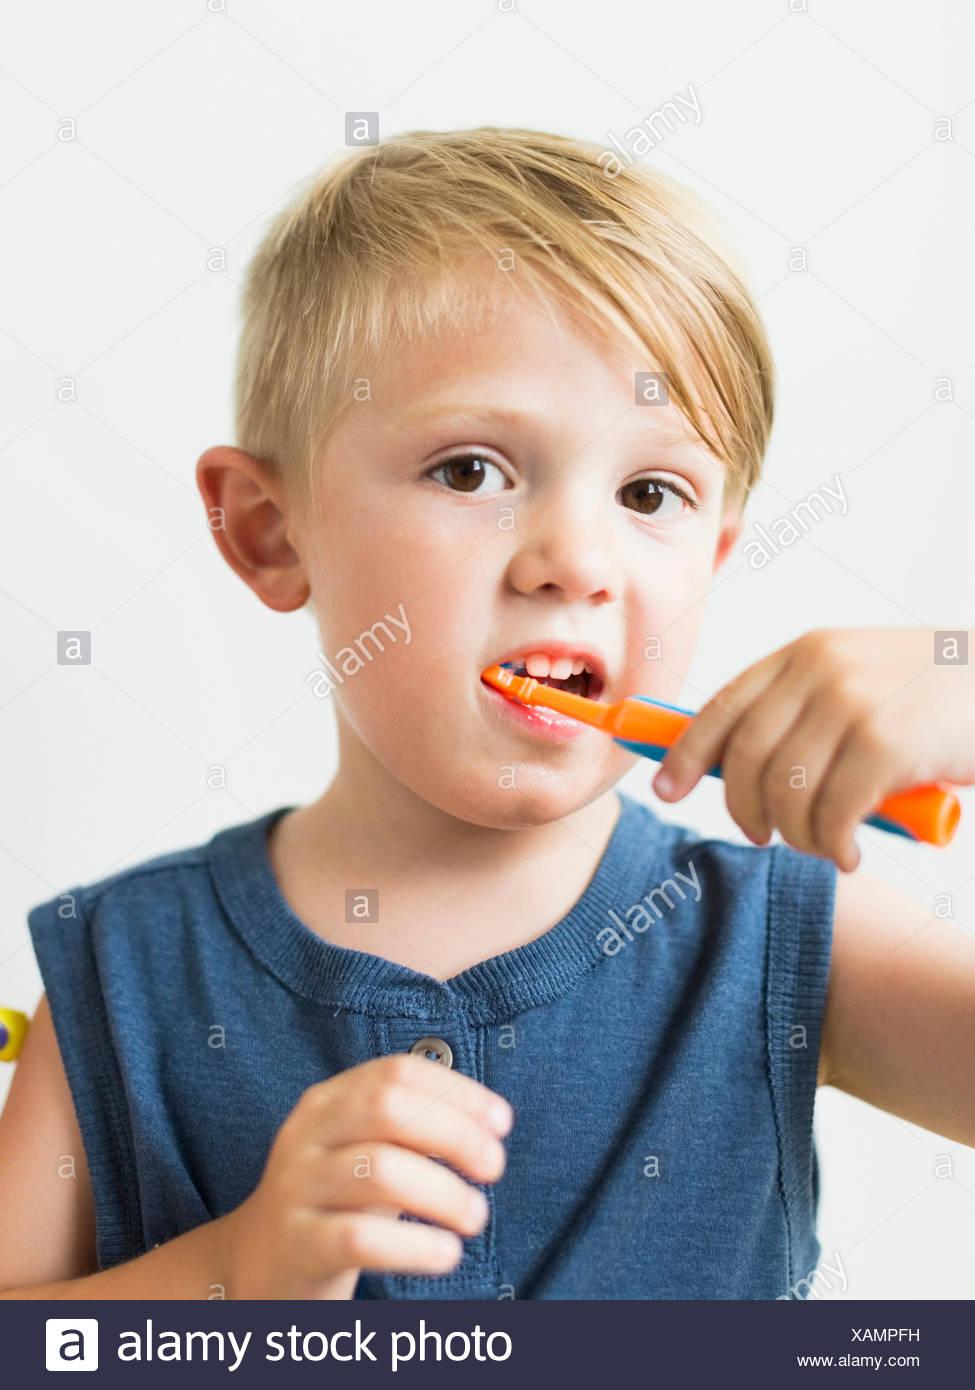 Little boy (2-3) brushing teeth - Stock Image